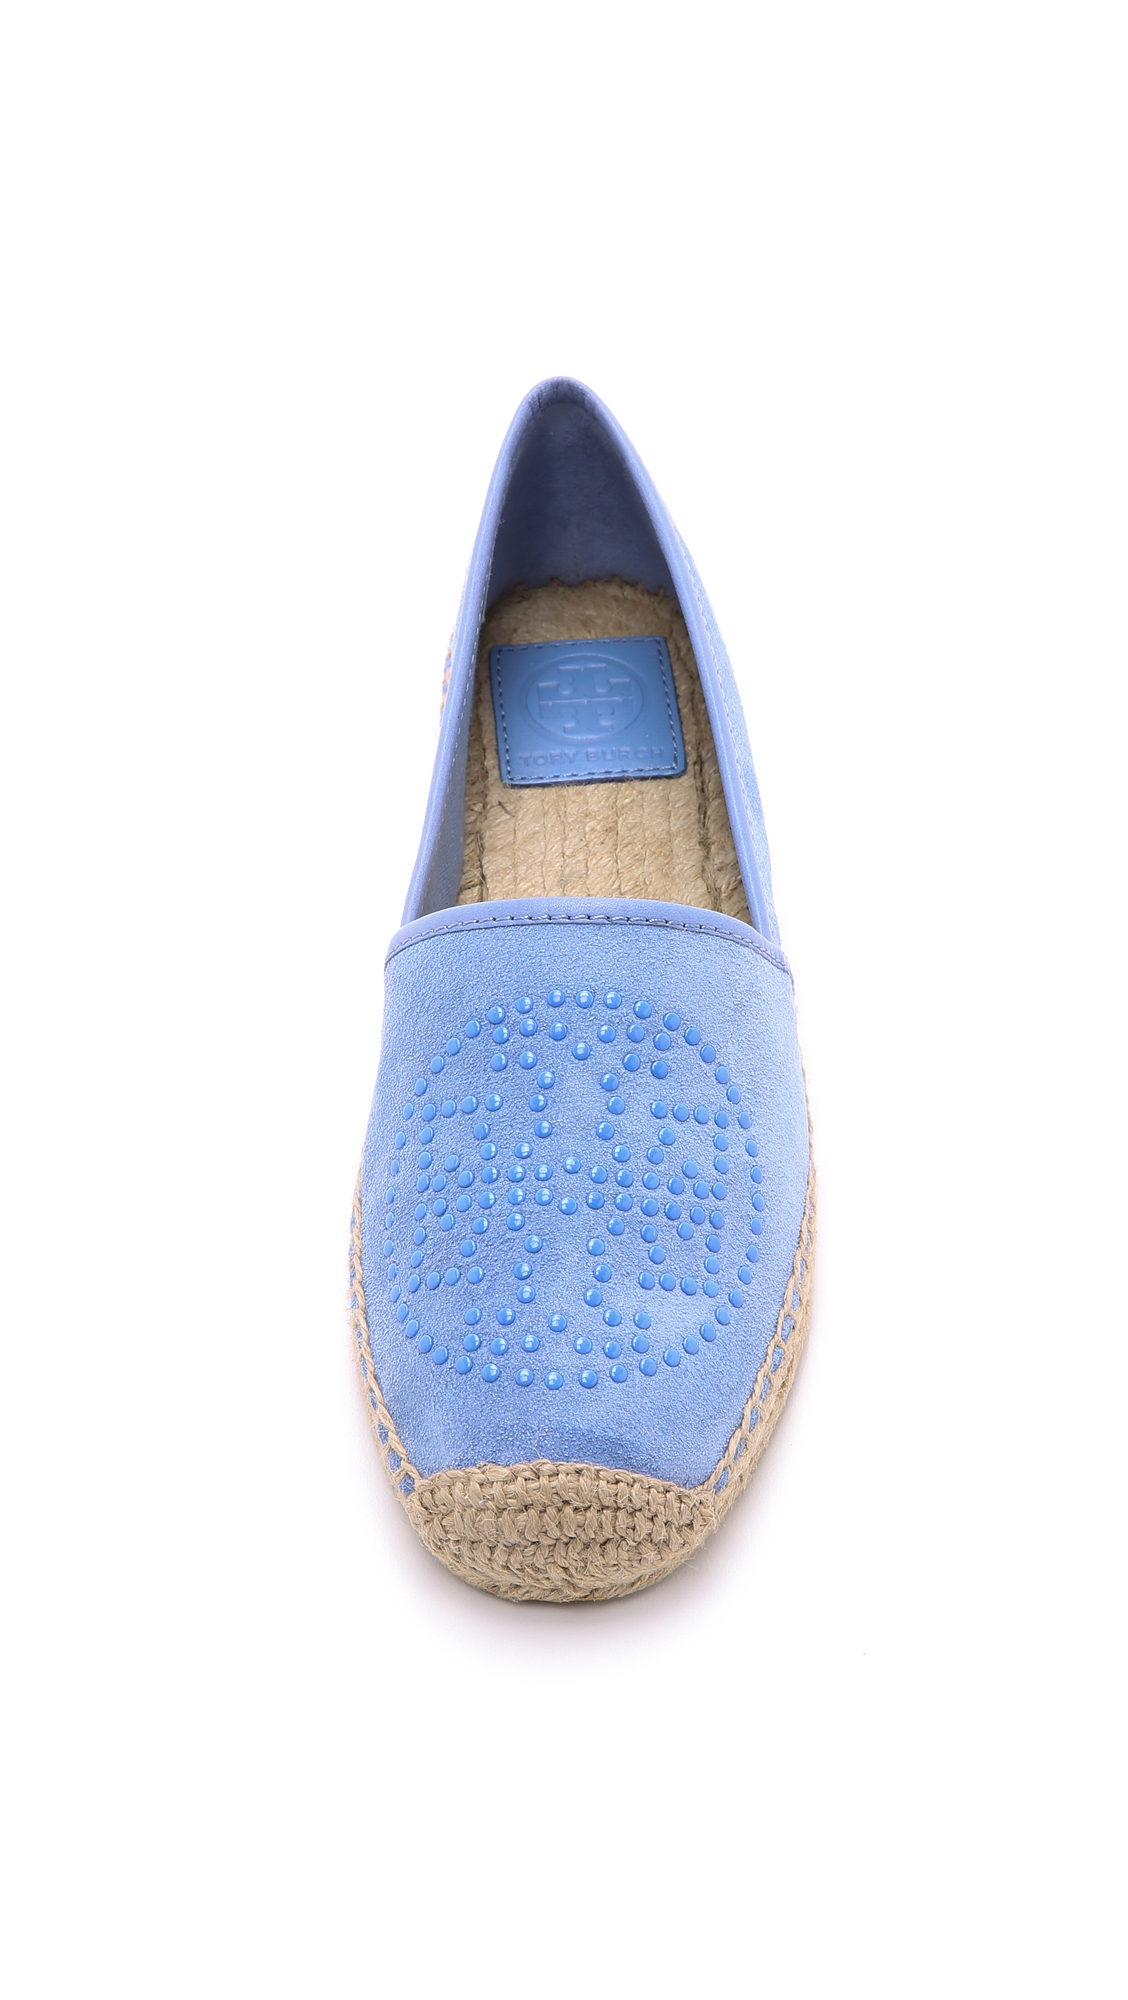 9096e21b4fe7 Lyst - Tory Burch Kirby Suede Flat Espadrilles - Pashmina in Blue